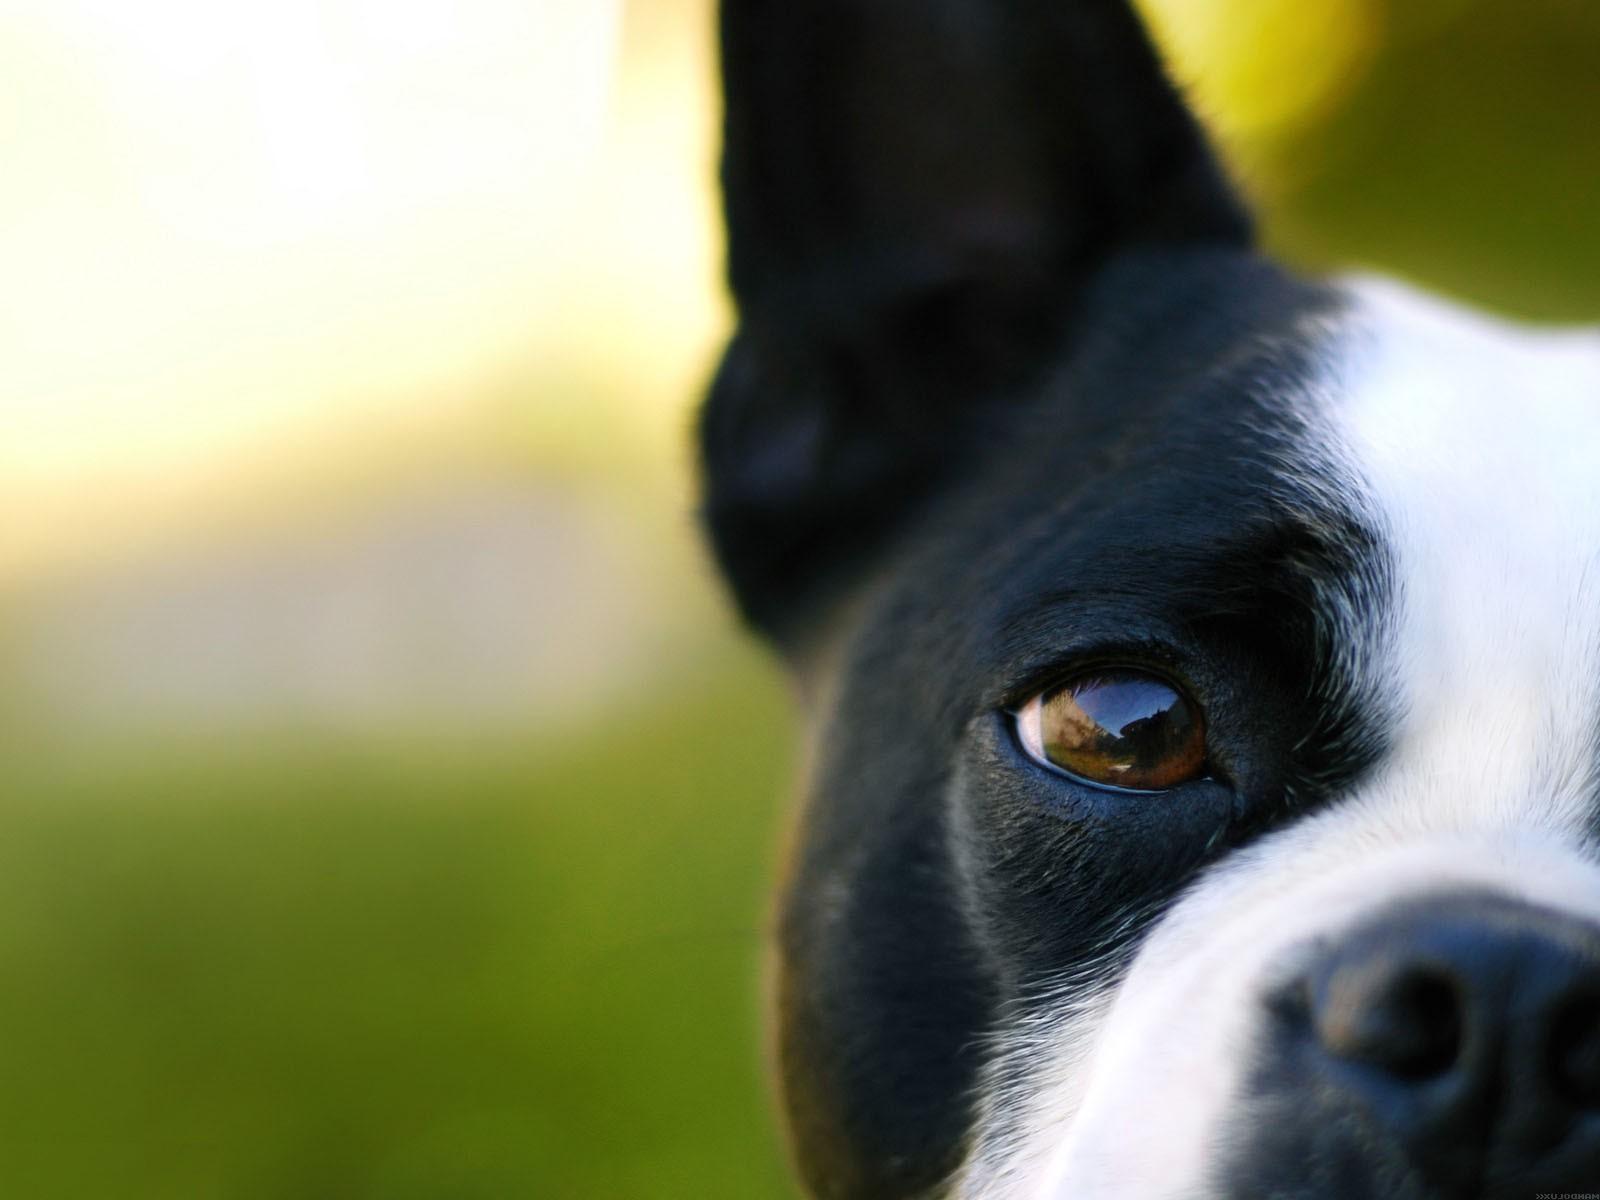 http://4.bp.blogspot.com/_nEmB3Z5F5EM/S62UDDrUQjI/AAAAAAAAIUw/YxnN7N1uliY/s1600/Dog_eye_Computer_Wallpaper.jpg